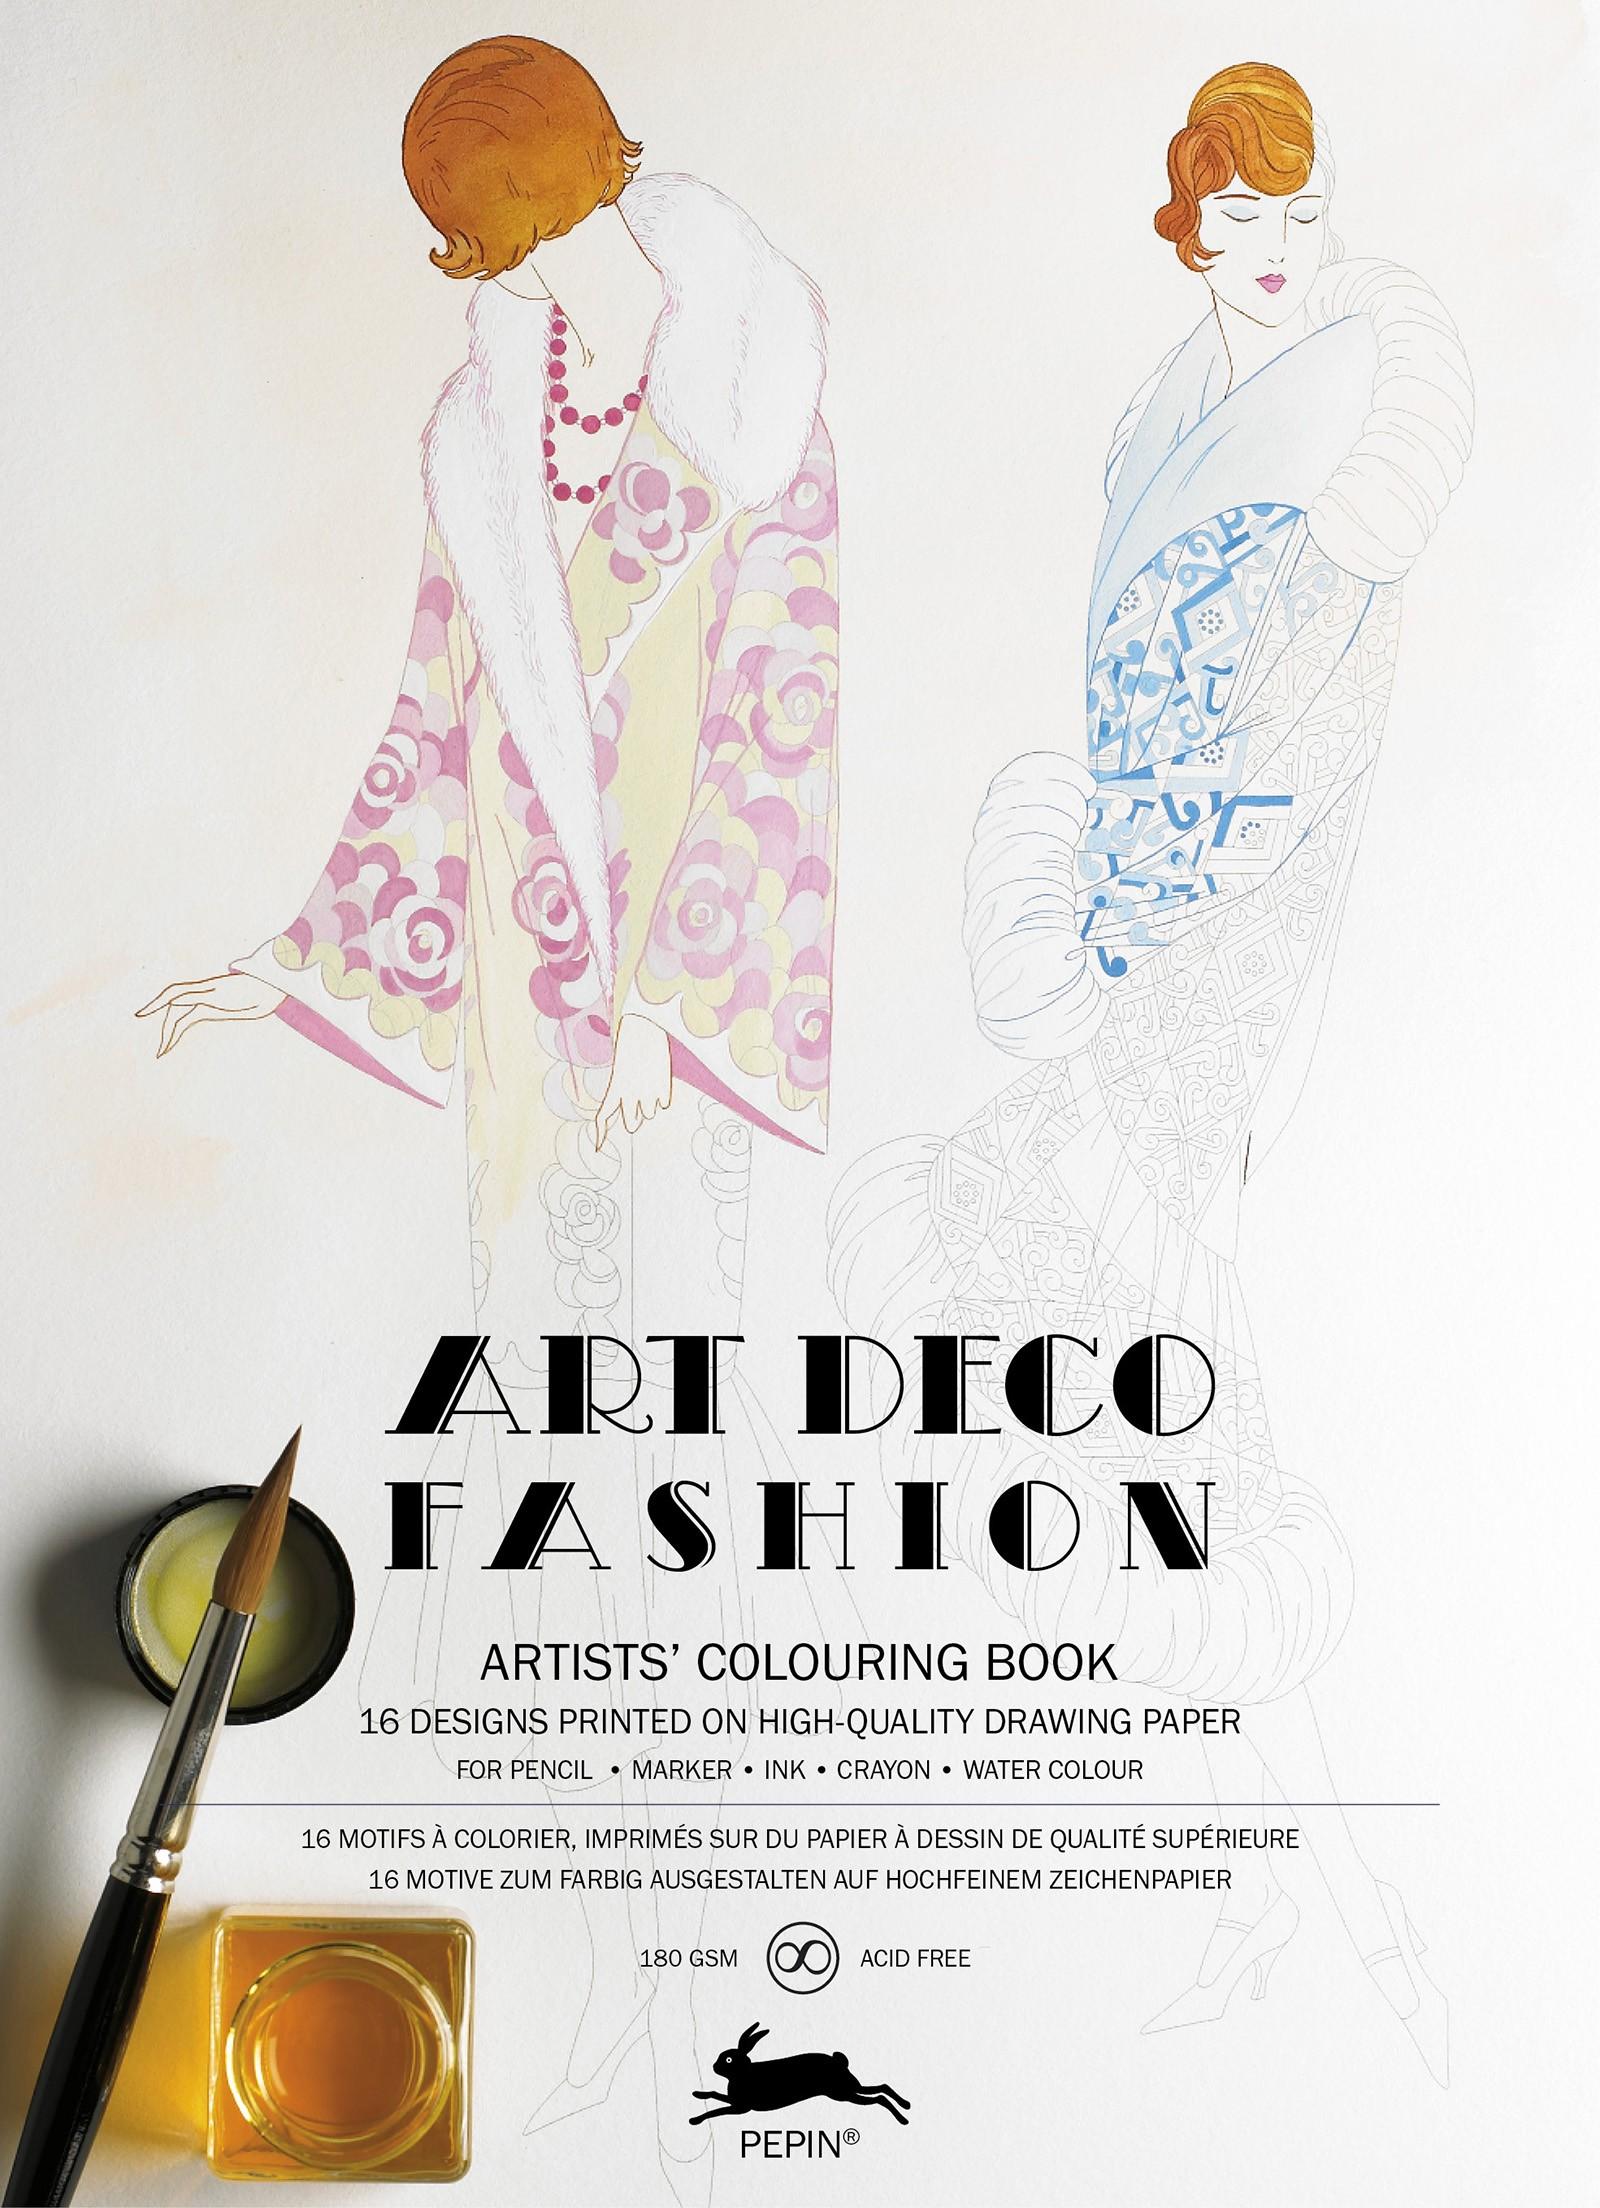 Fashion Books 2017: Art Deco Fashion Artists' Colouring Book By Pepin Press